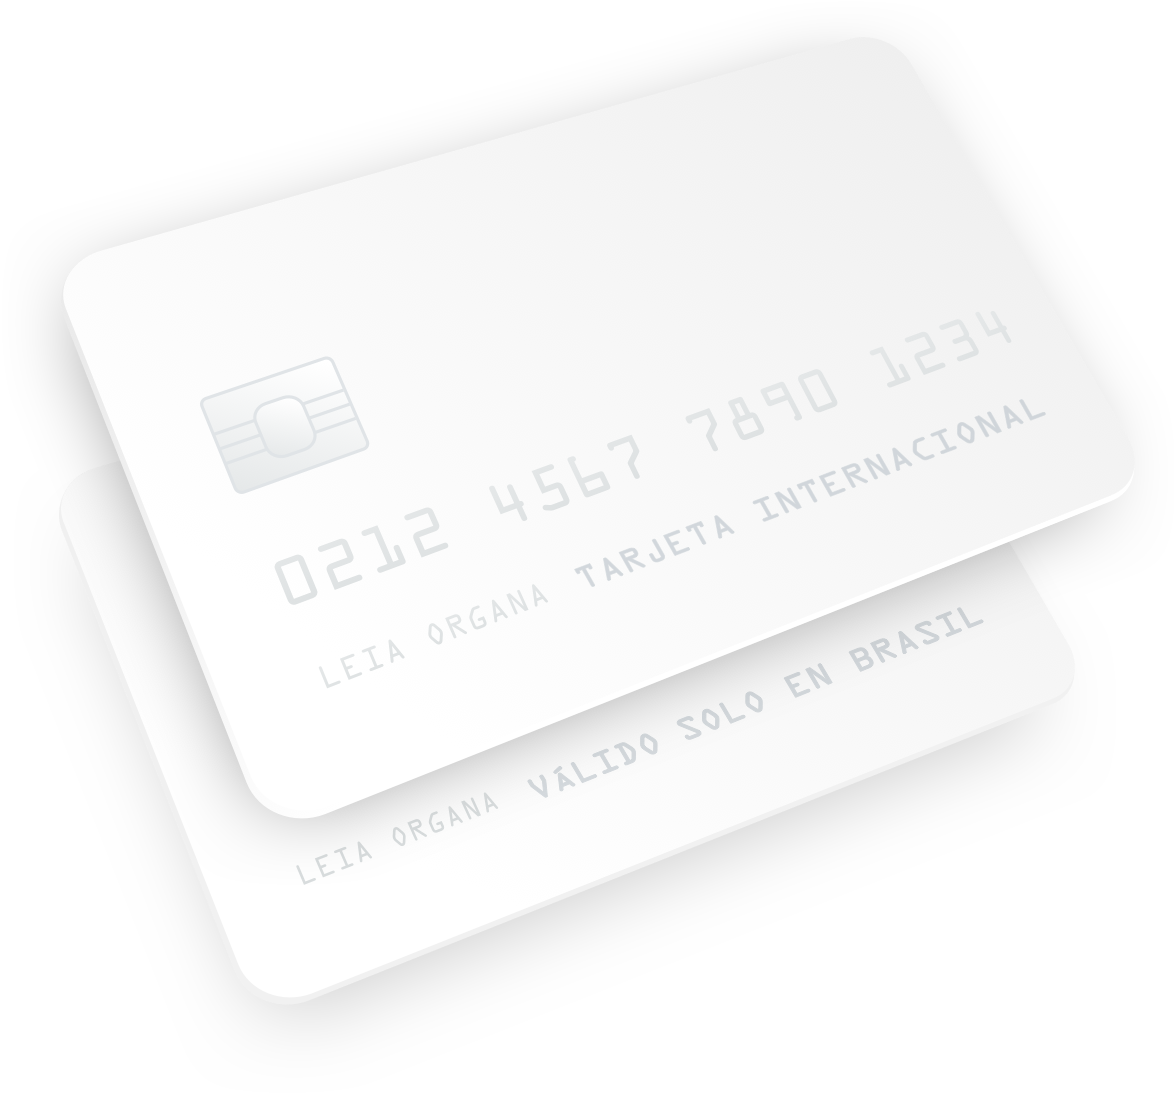 Tarjetas de Crédito en Brasil